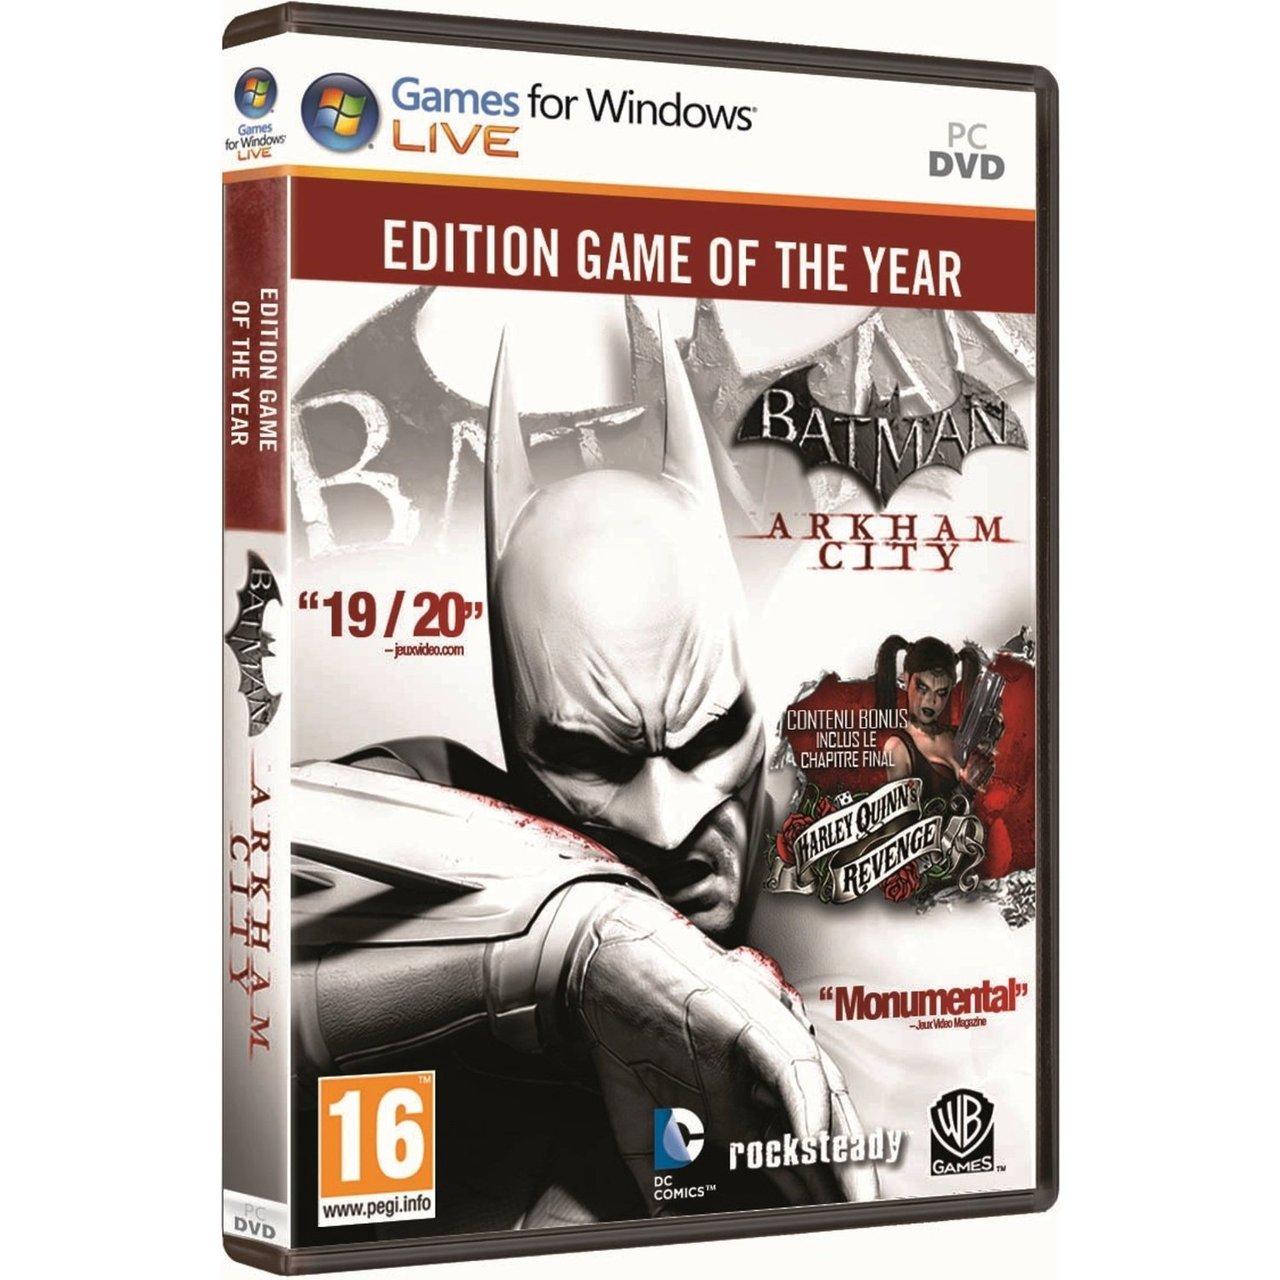 Batman-ArkhamCity-GameoftheYearEdition Multi Div 003